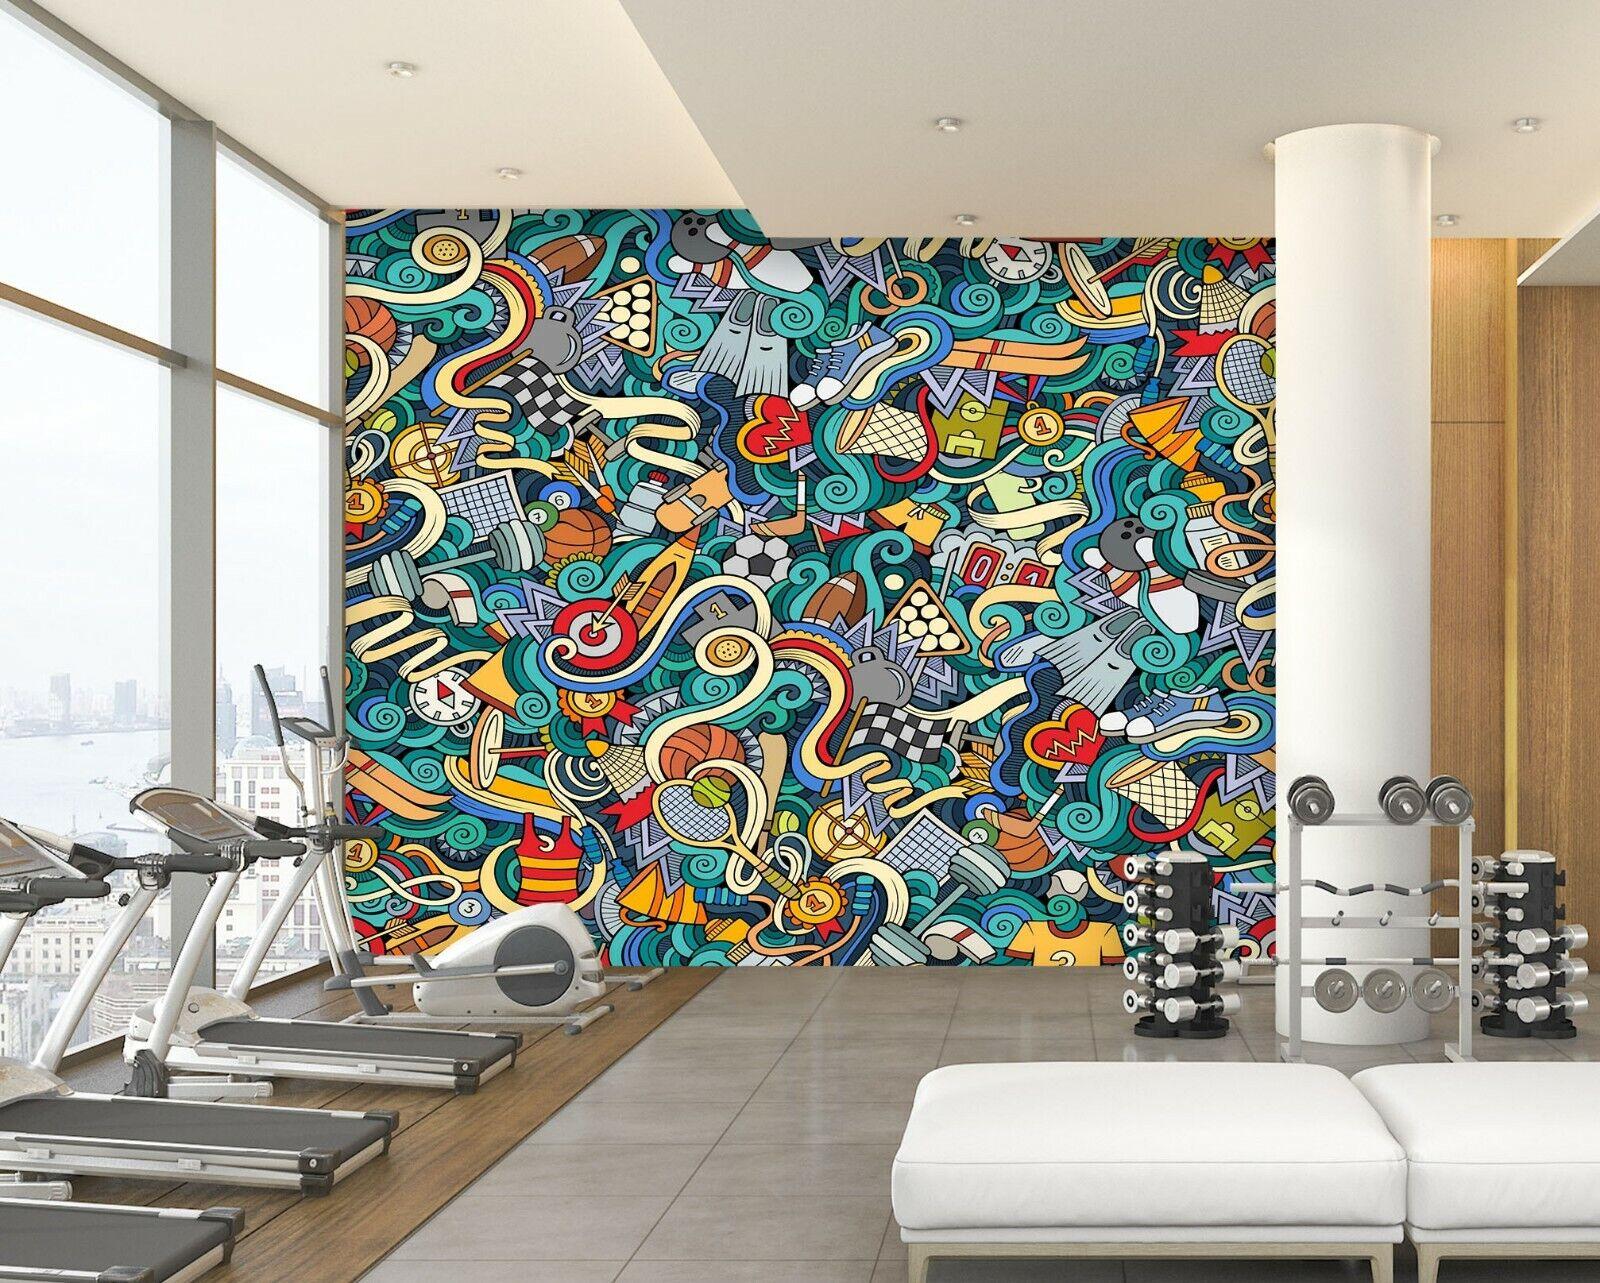 3D Graffitti N80 Business Wallpaper Wall Mural Self-adhesive Commerce Sunday